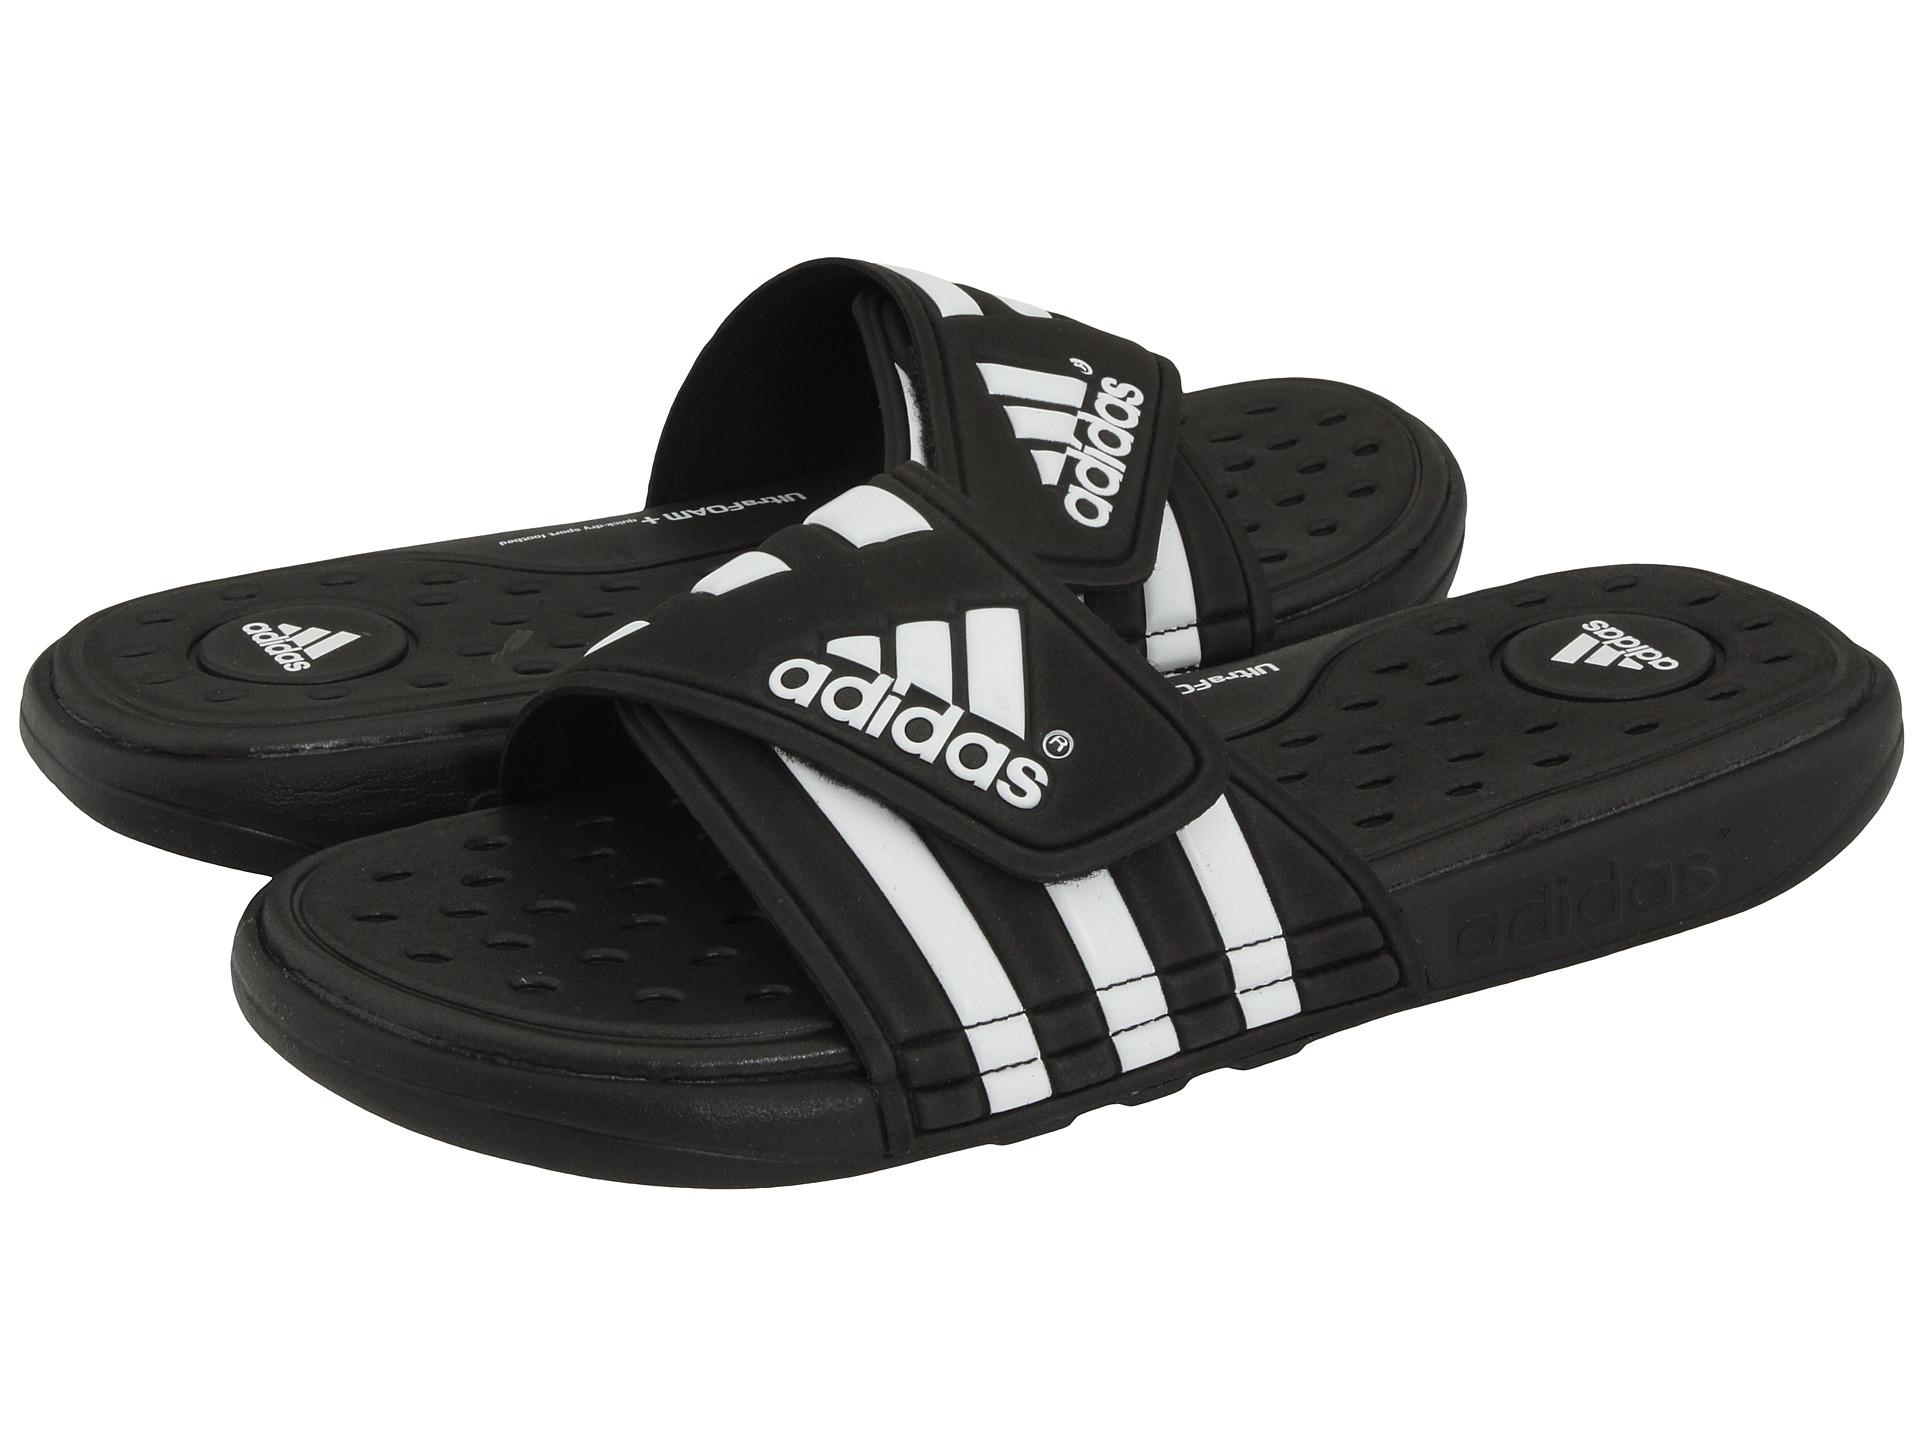 Adidas Adissage Sc At Zappos Com